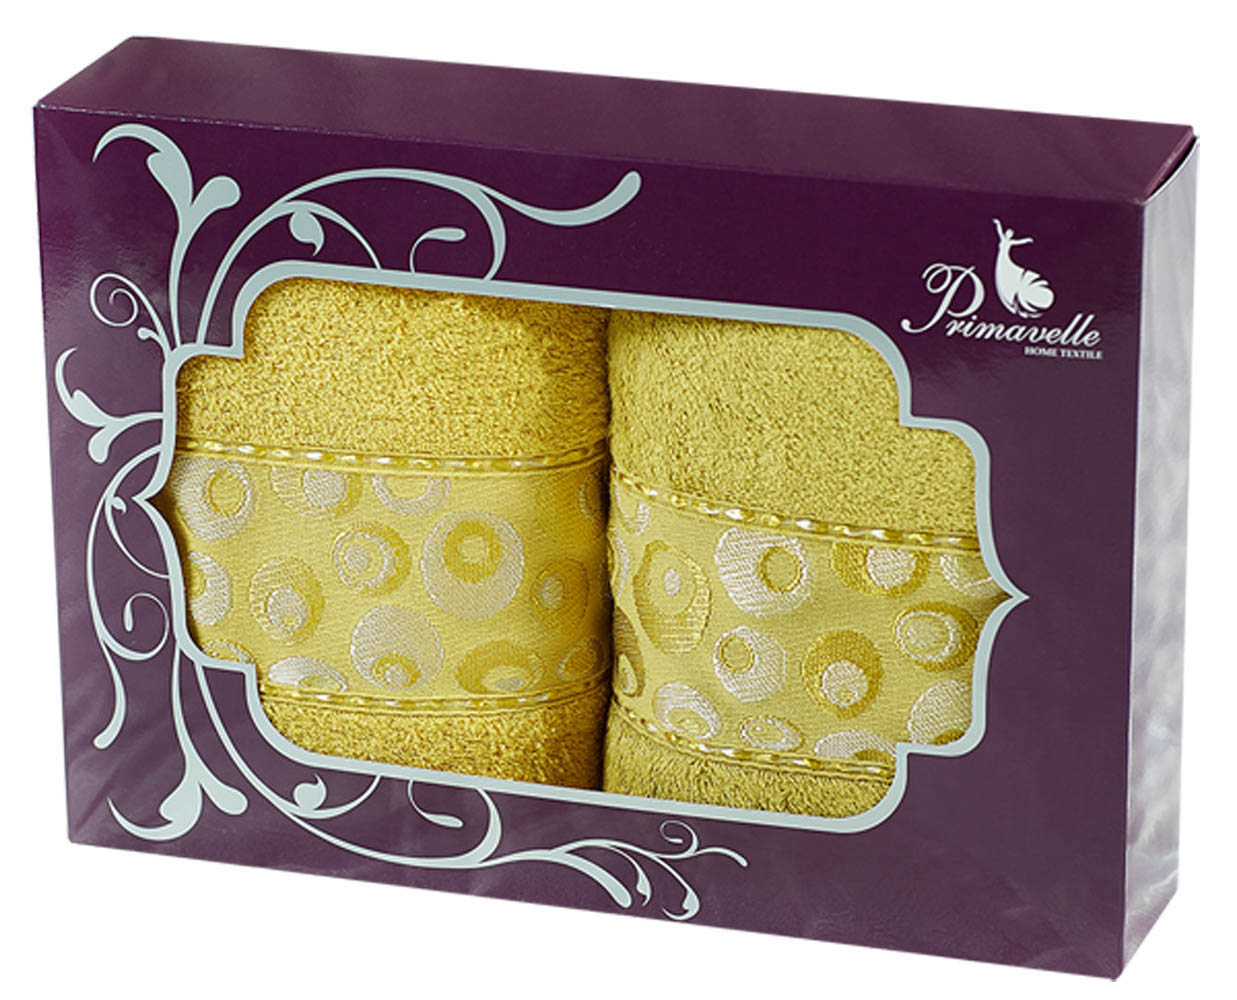 Полотенца Primavelle Полотенце Adele Цвет: Золото+Горчичный (50х90 см - 2 шт) цена и фото